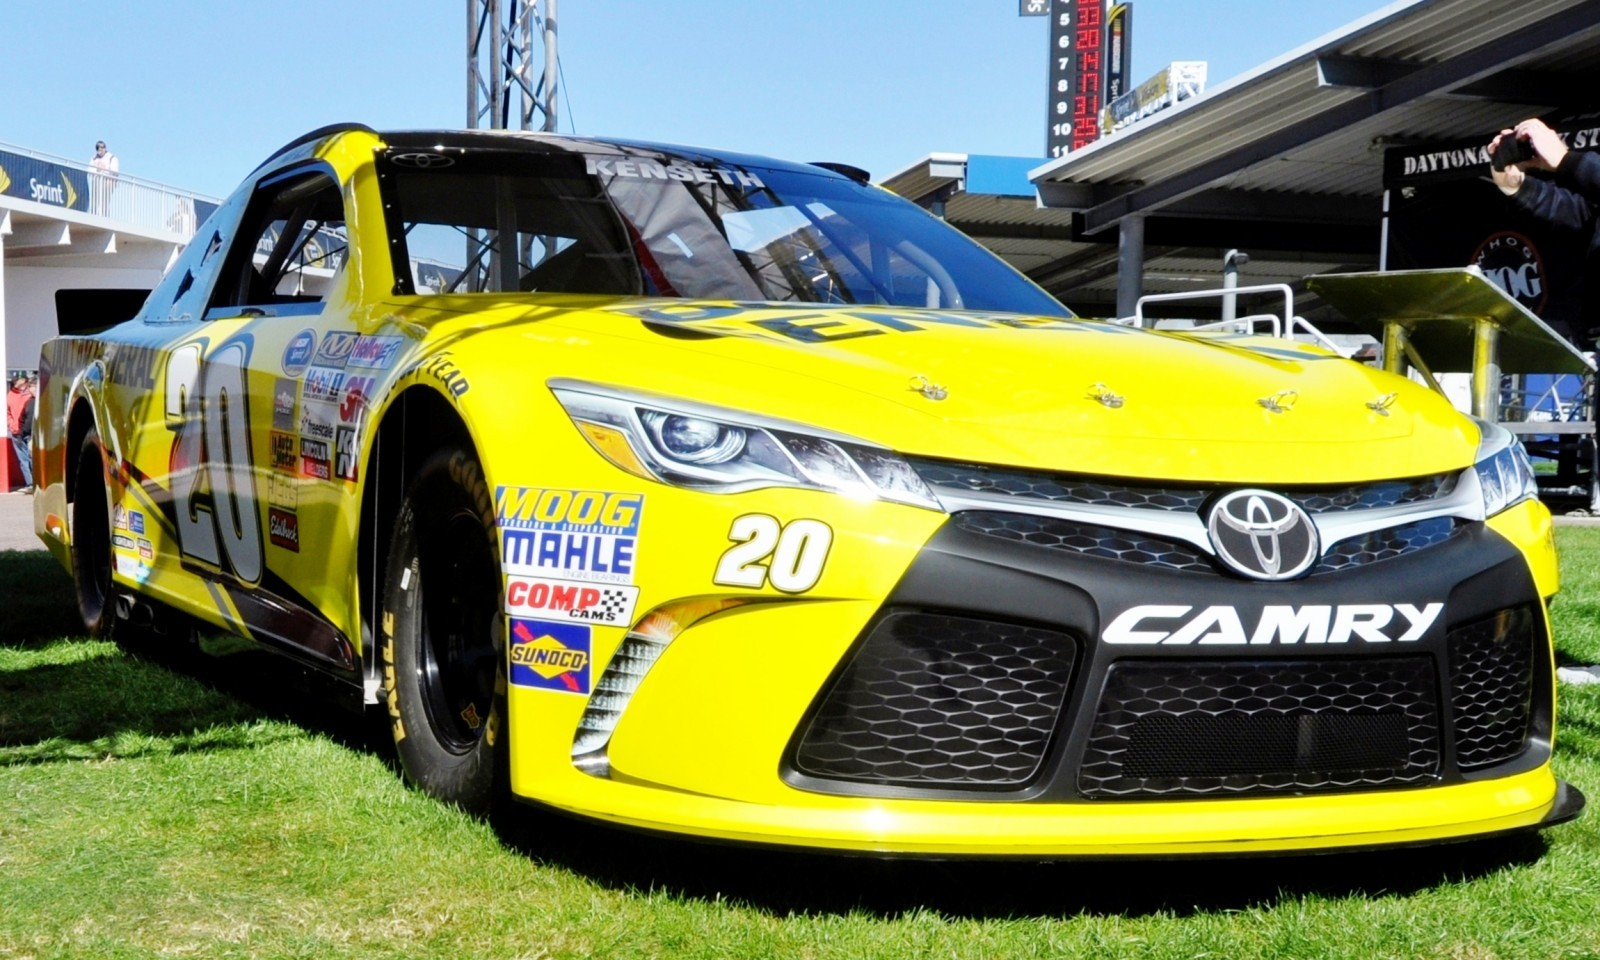 2015 Toyota Camry NASCAR Dollar General 18